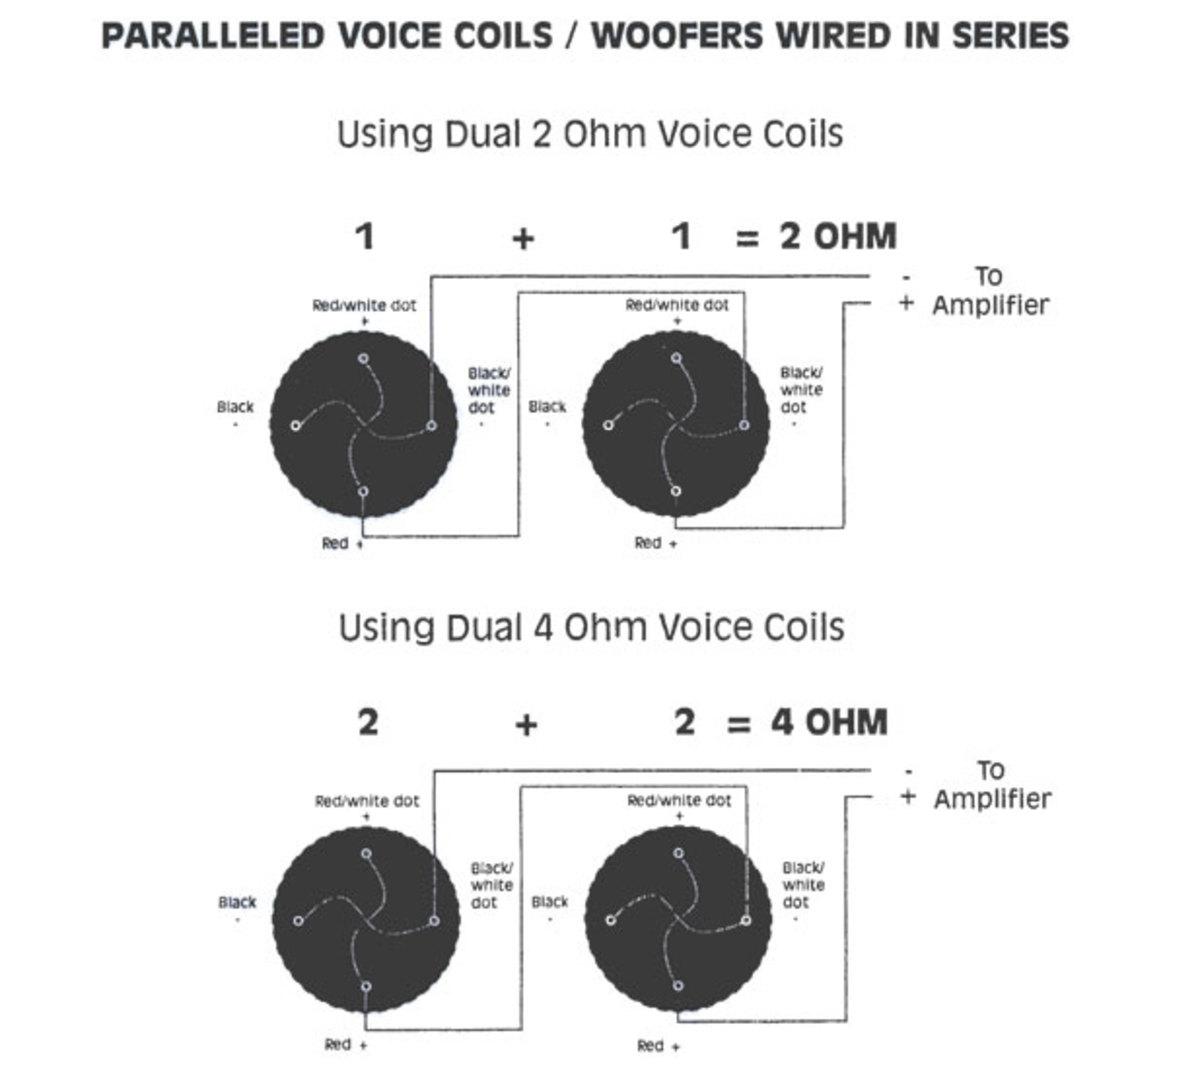 dual 1 ohm sub wiring dual image wiring diagram wiring dual 4 ohm subs wiring auto wiring diagram schematic on dual 1 ohm sub wiring